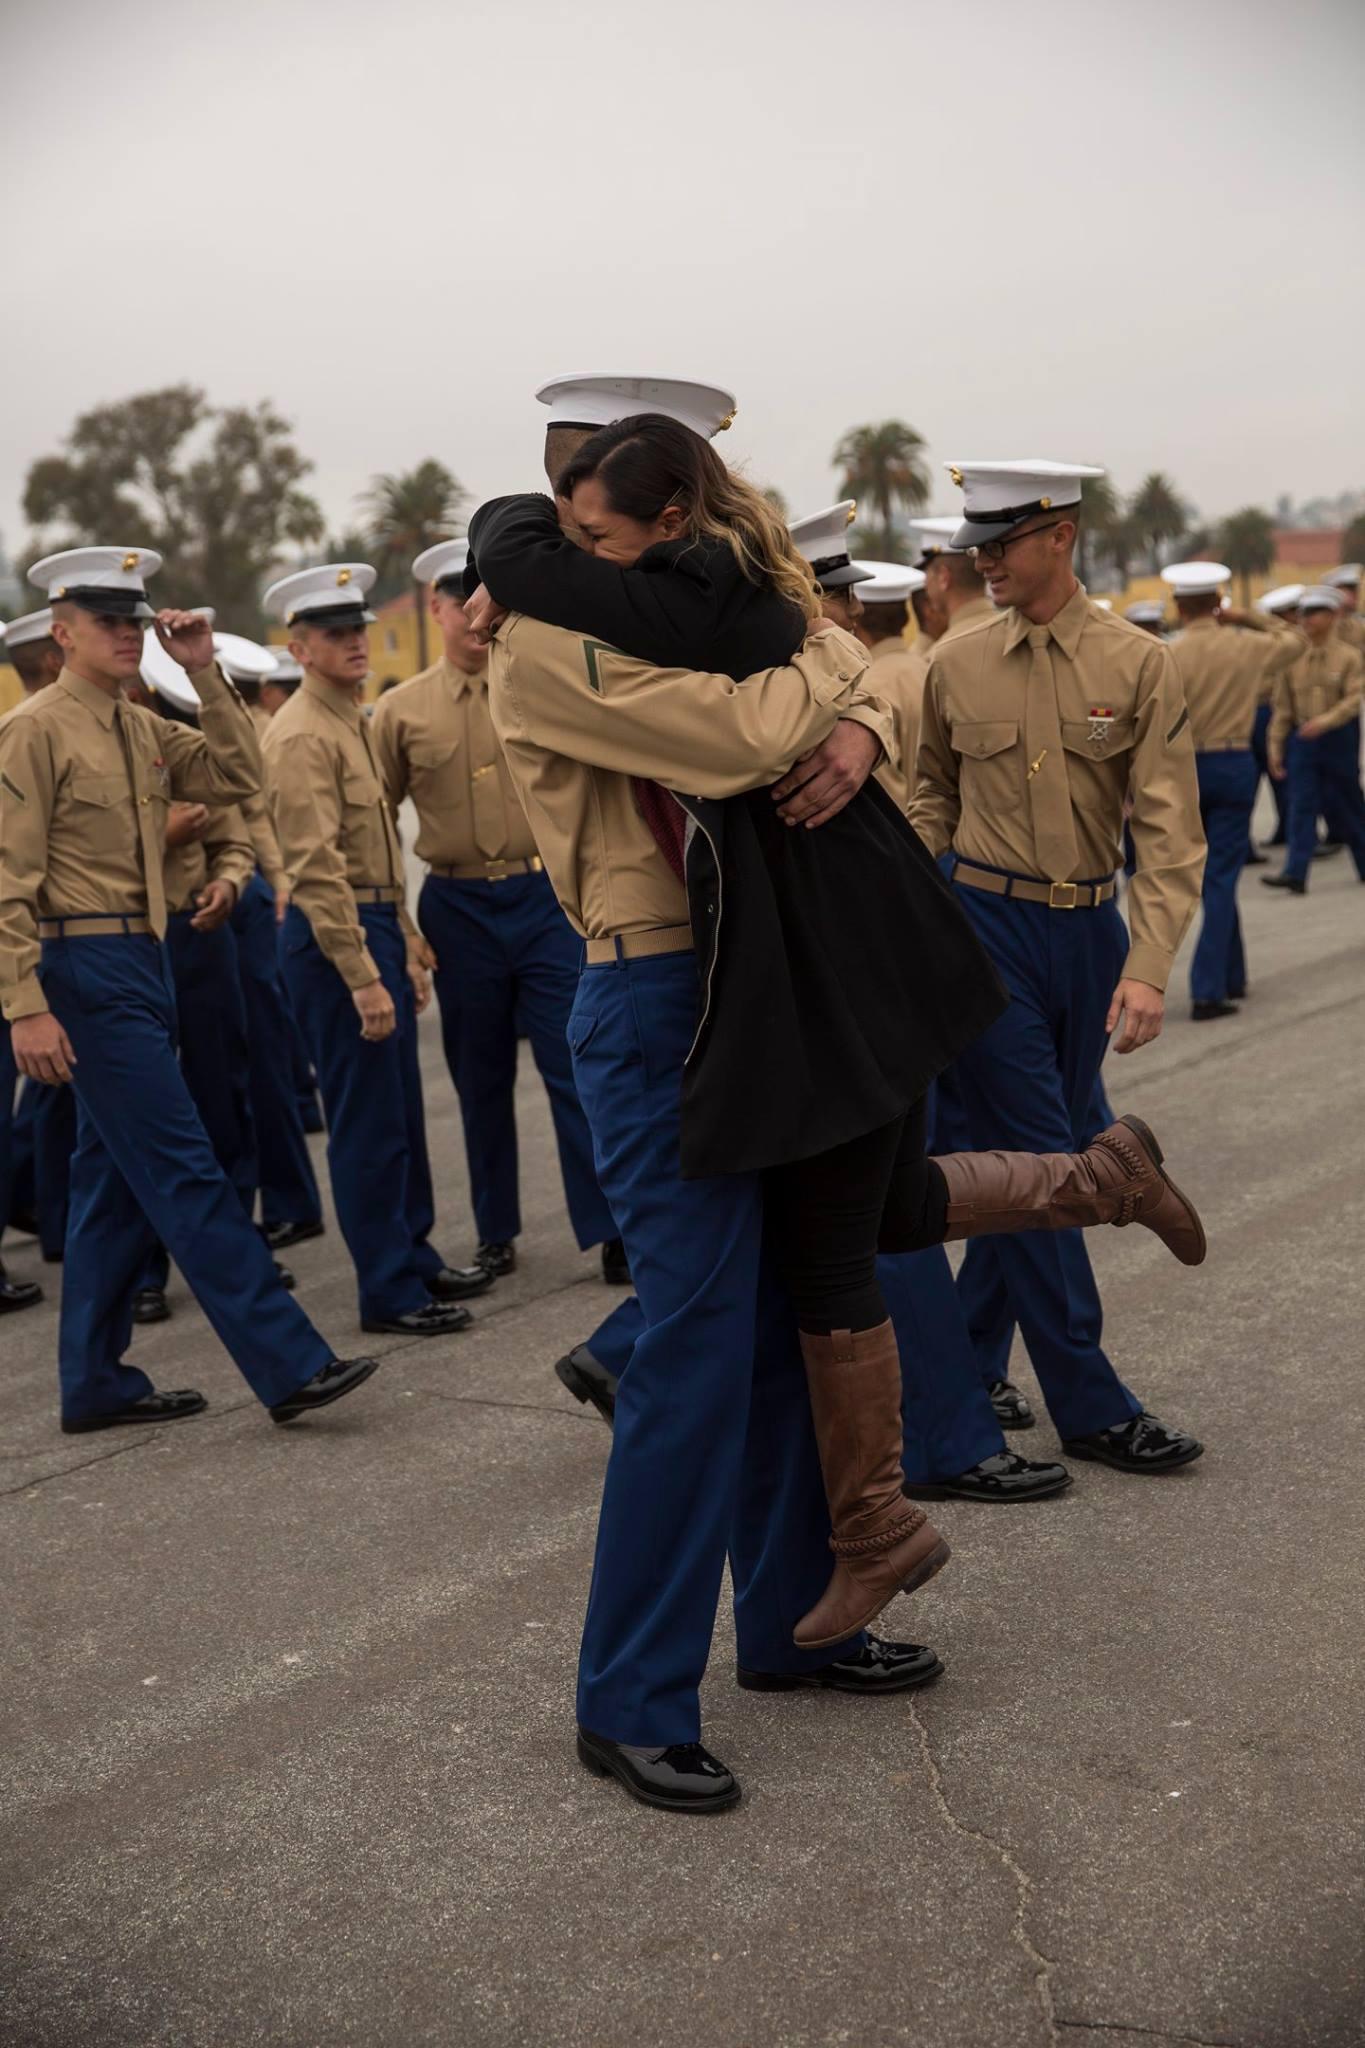 Marine Corps Recruit Depot San Diego Graduation Graduation